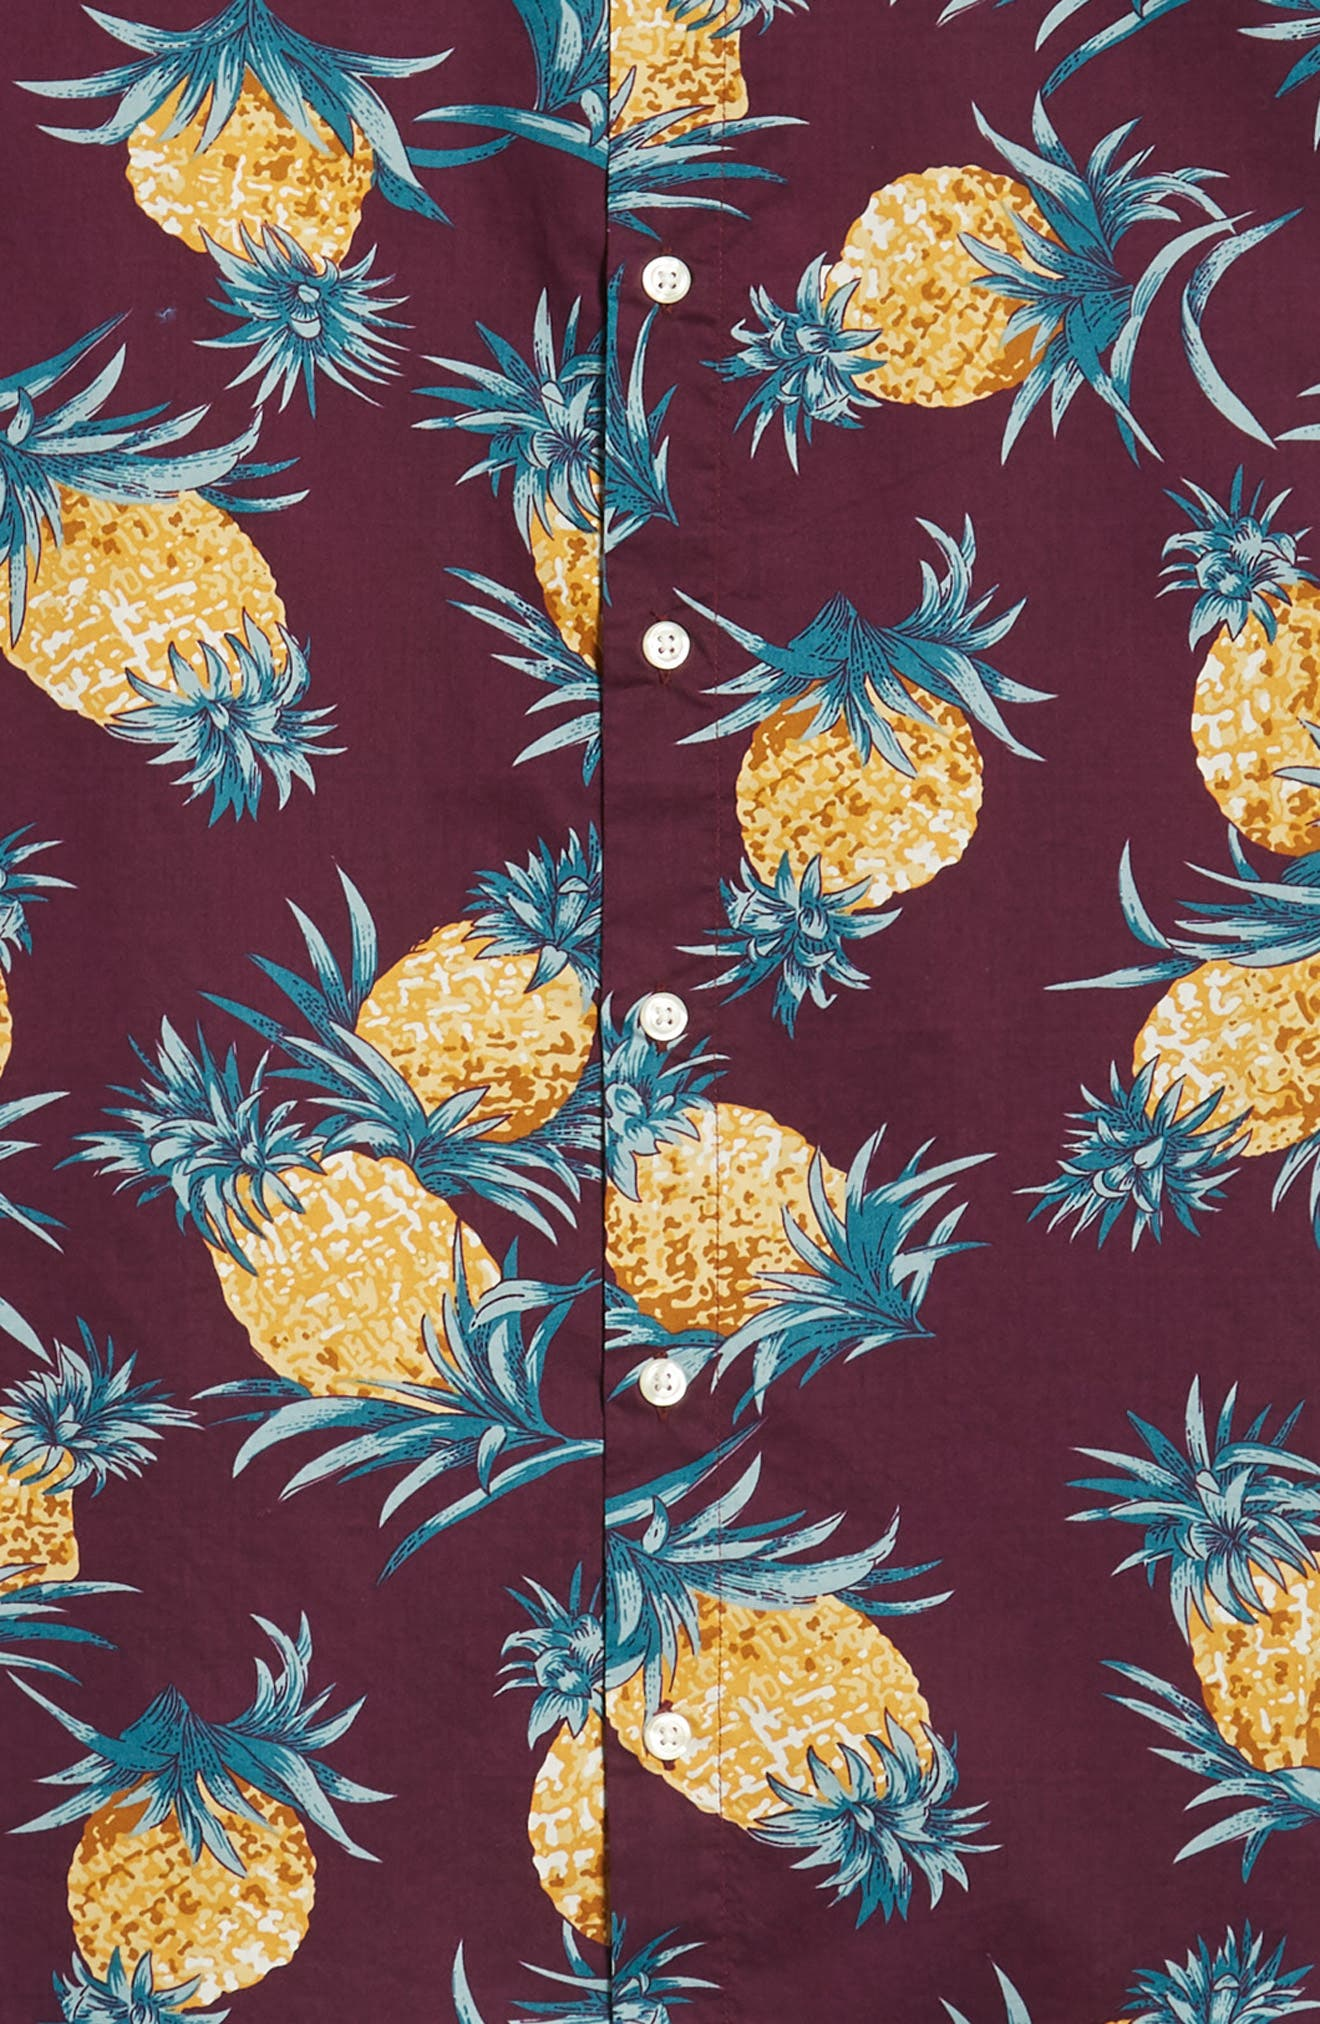 Riviera Slim Fit Pineapple Print Sport Shirt,                             Alternate thumbnail 6, color,                             500